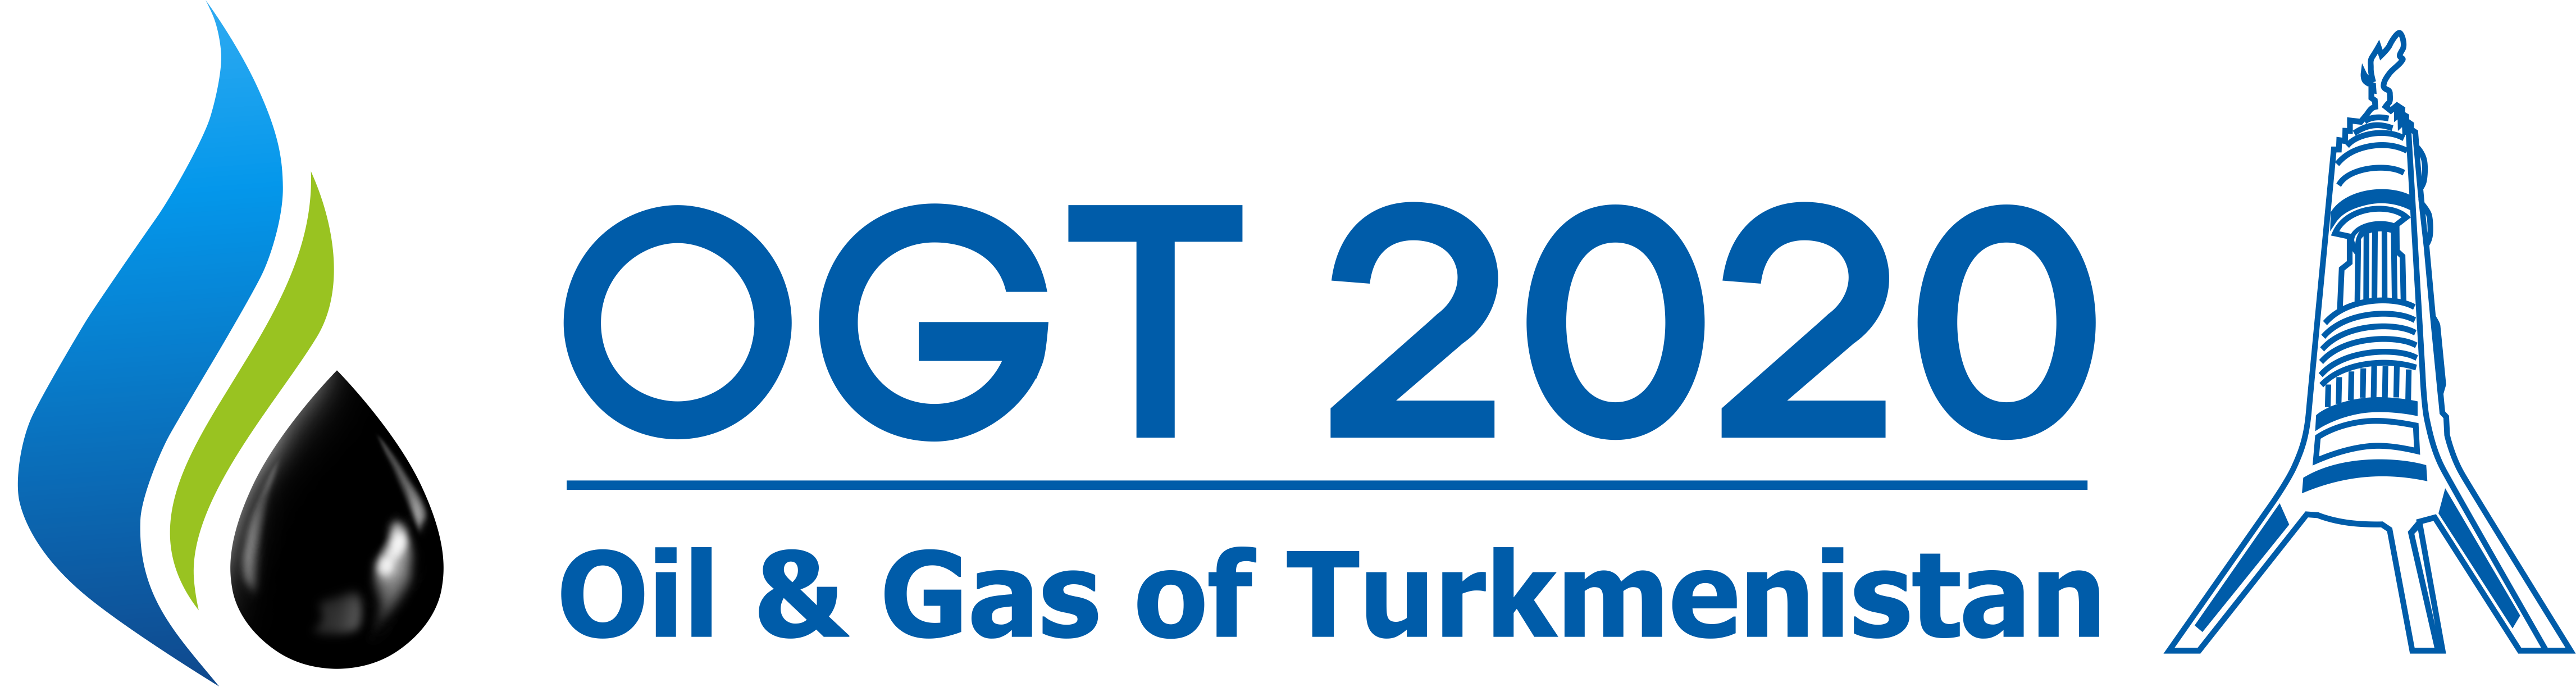 https://www.oilgas.gov.tm/storage/posts/962/original-15f97d456c4026.png